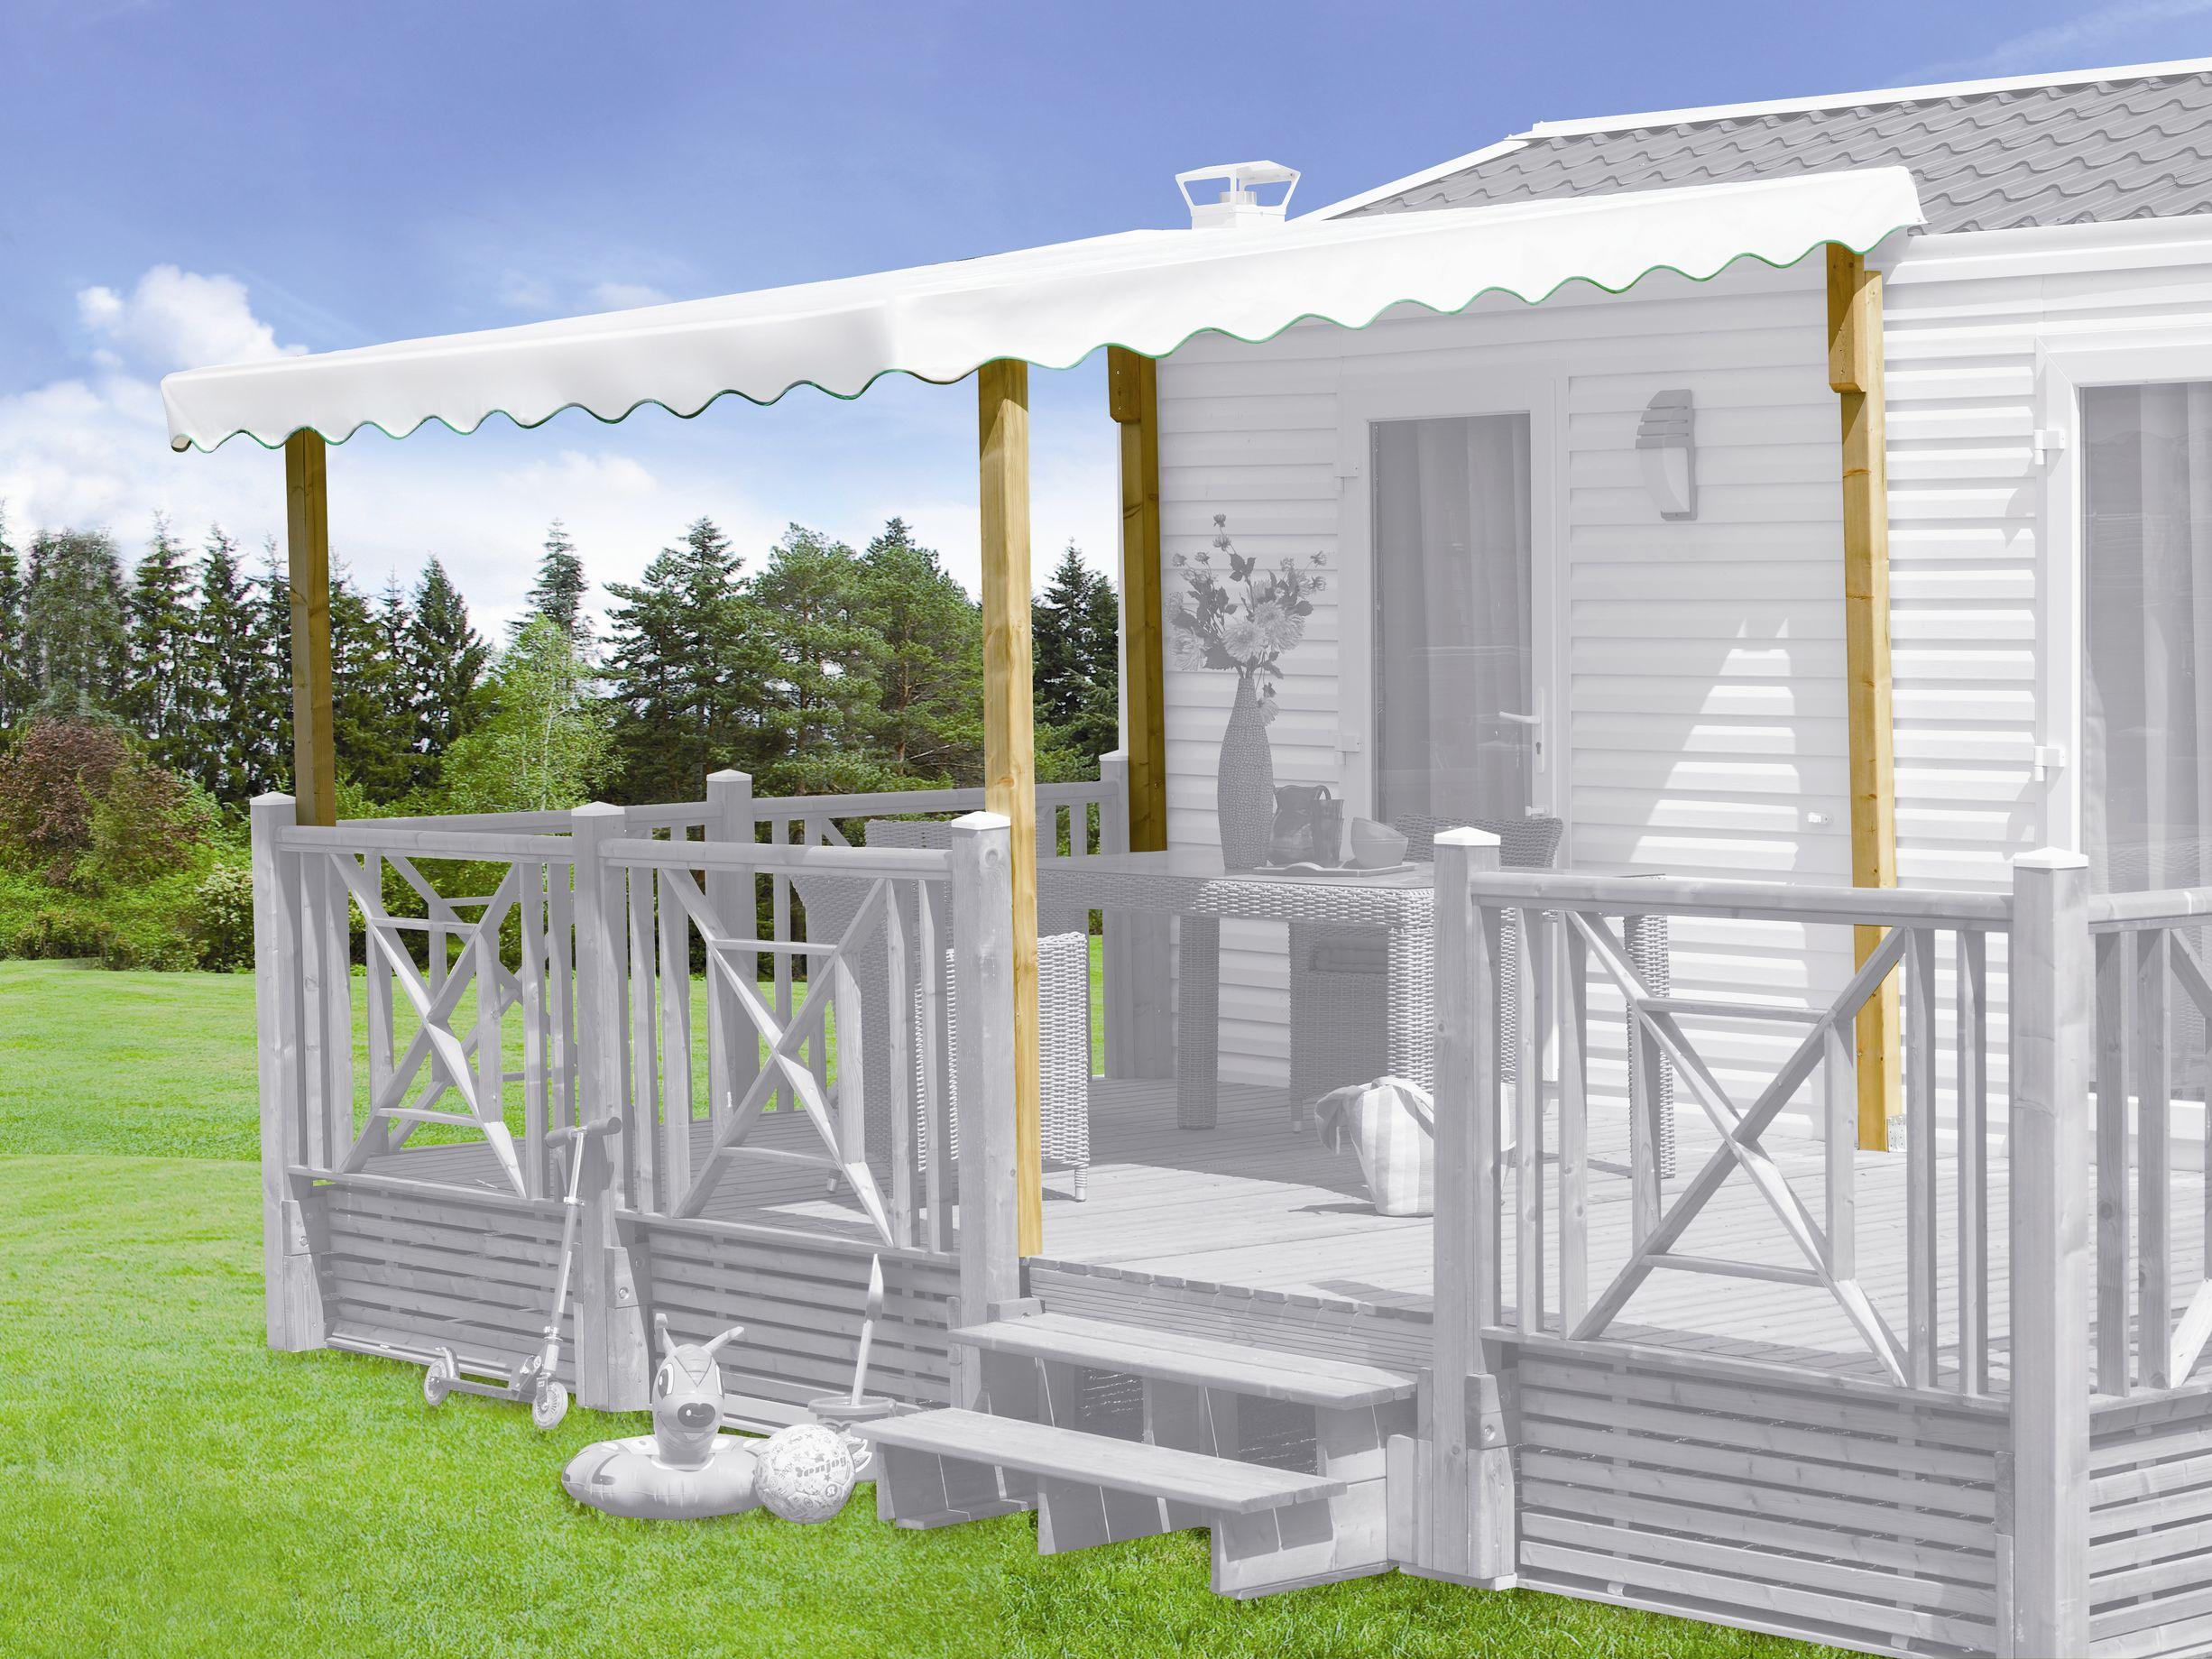 Kit couverture terrasse mobil-home terrasse ~~ Kit couverture ...